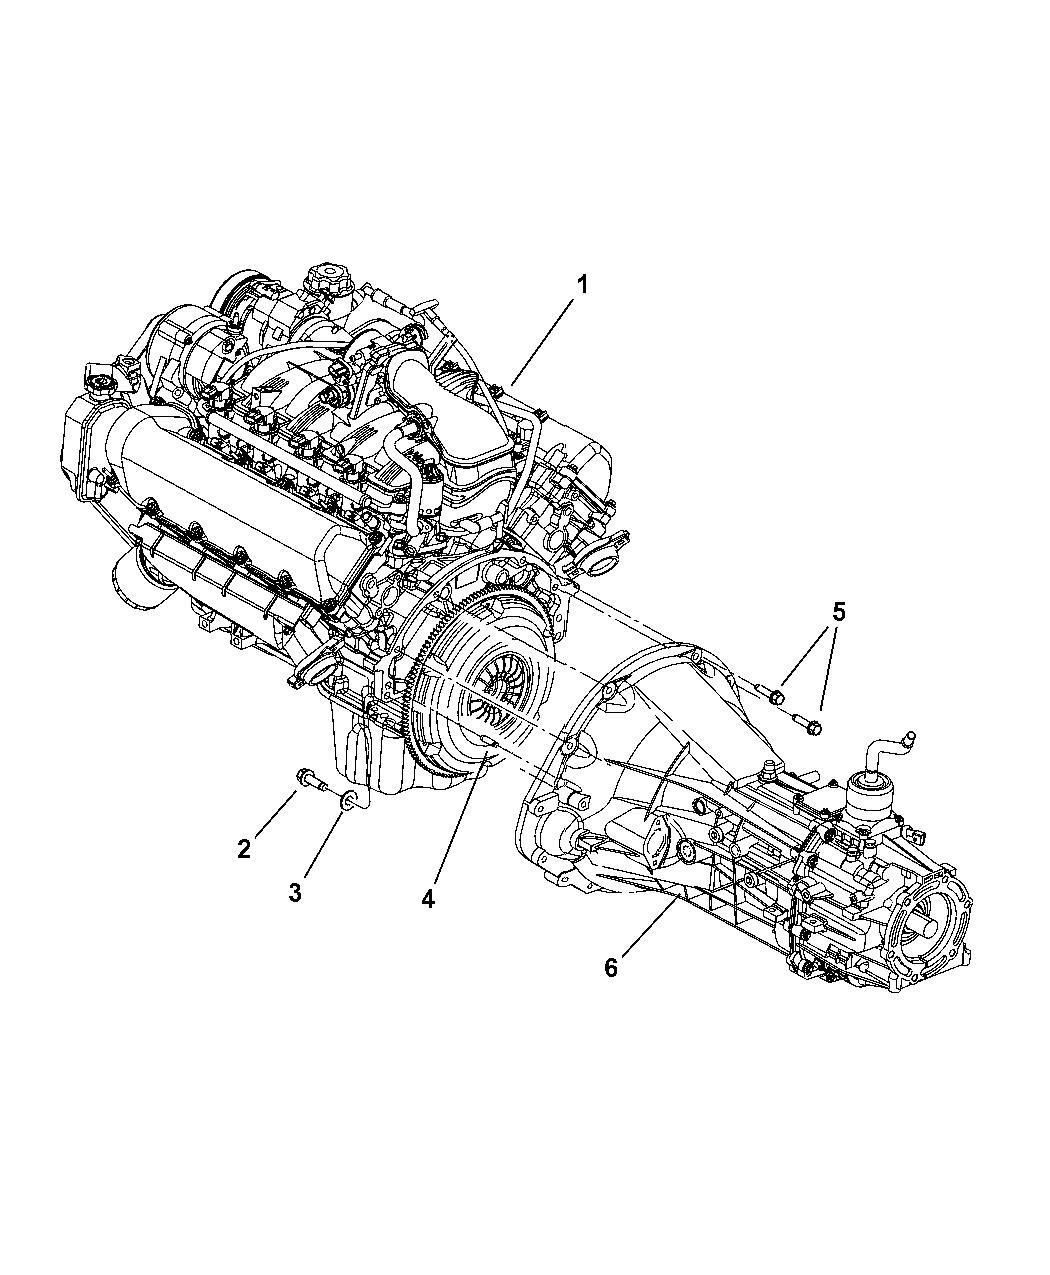 Dodge Dakota Transmission Mounting Of Manual Transmission